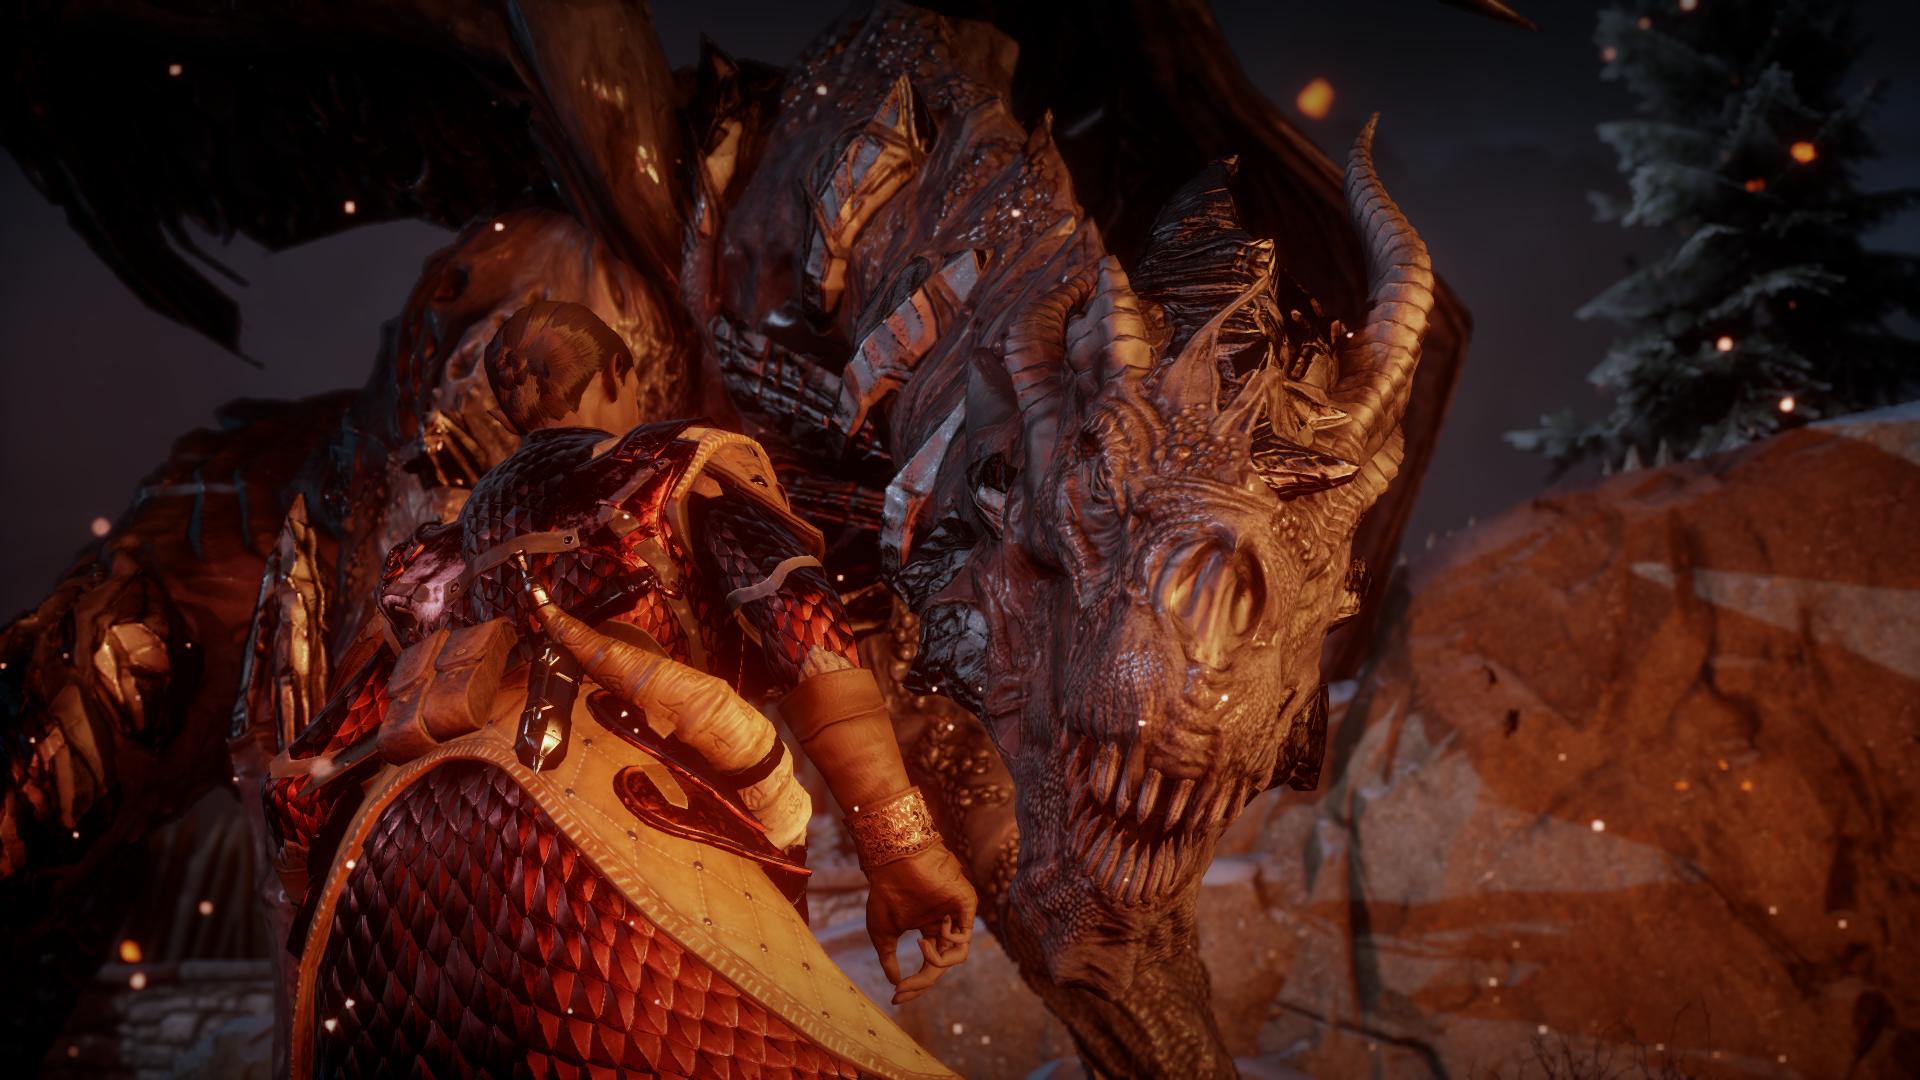 dragon_age_inquisition_screenshot_PC (3)